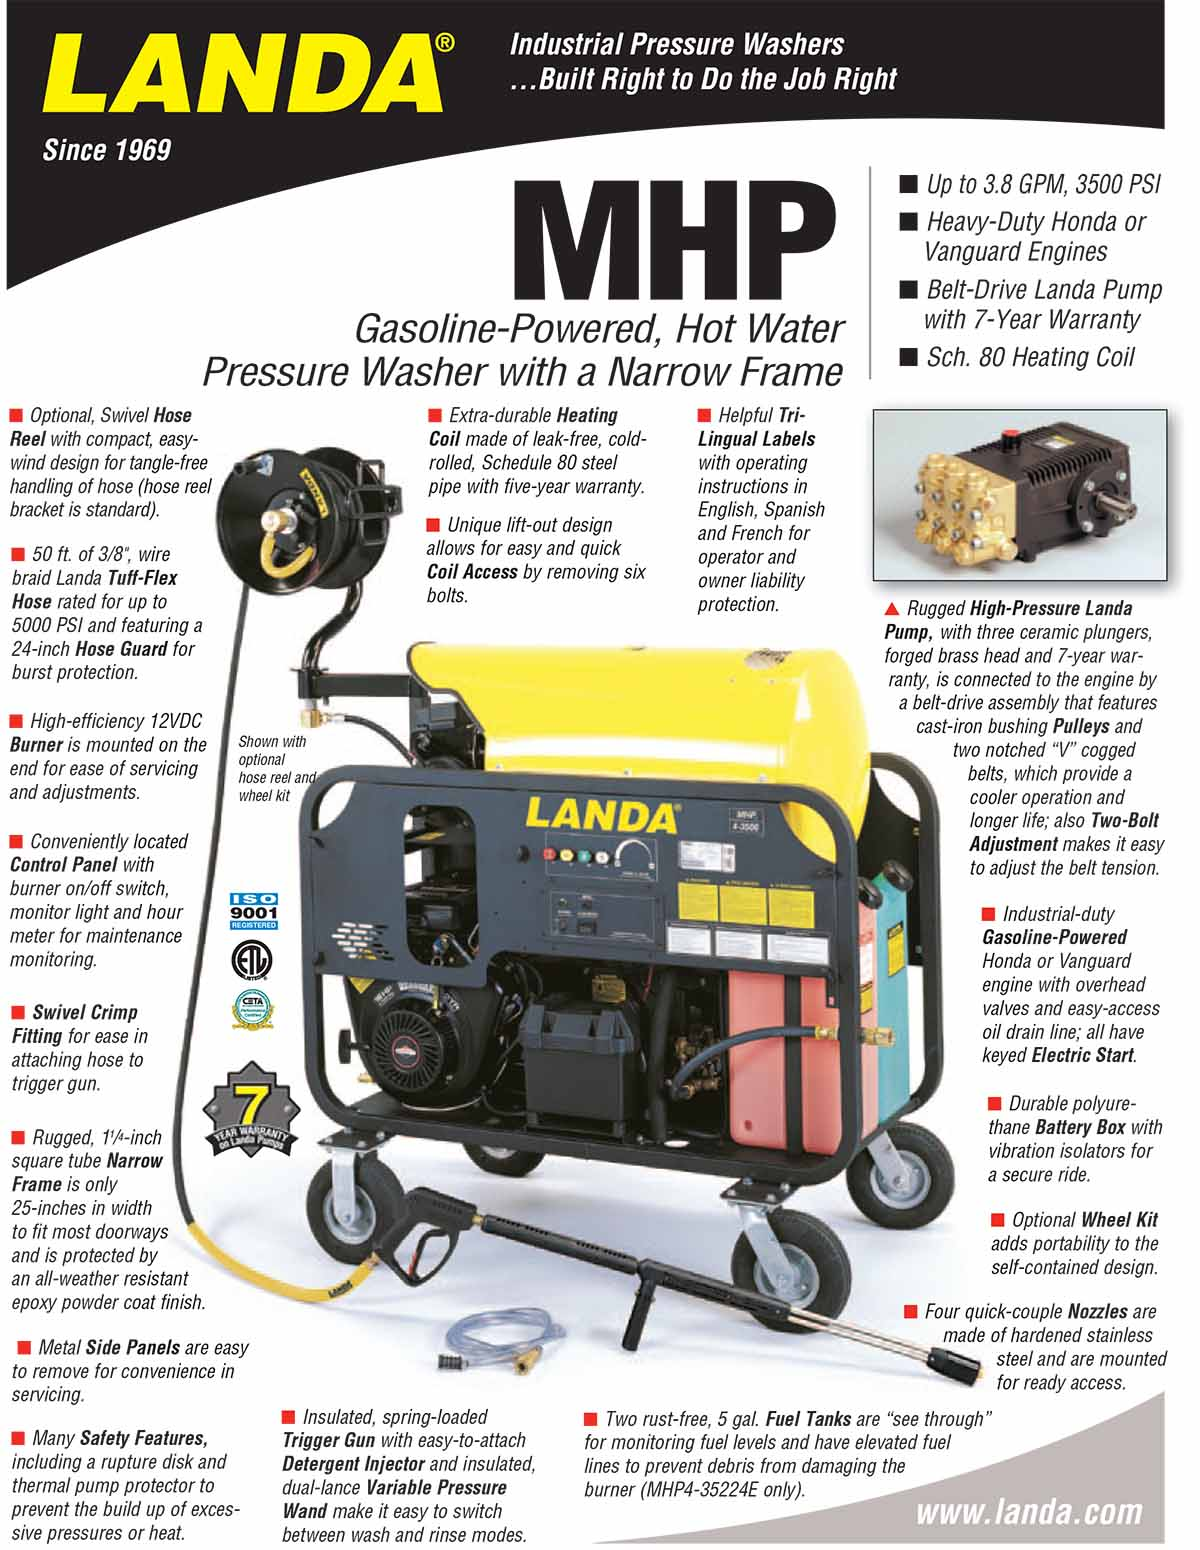 LANDA MHP Equipment Flyer